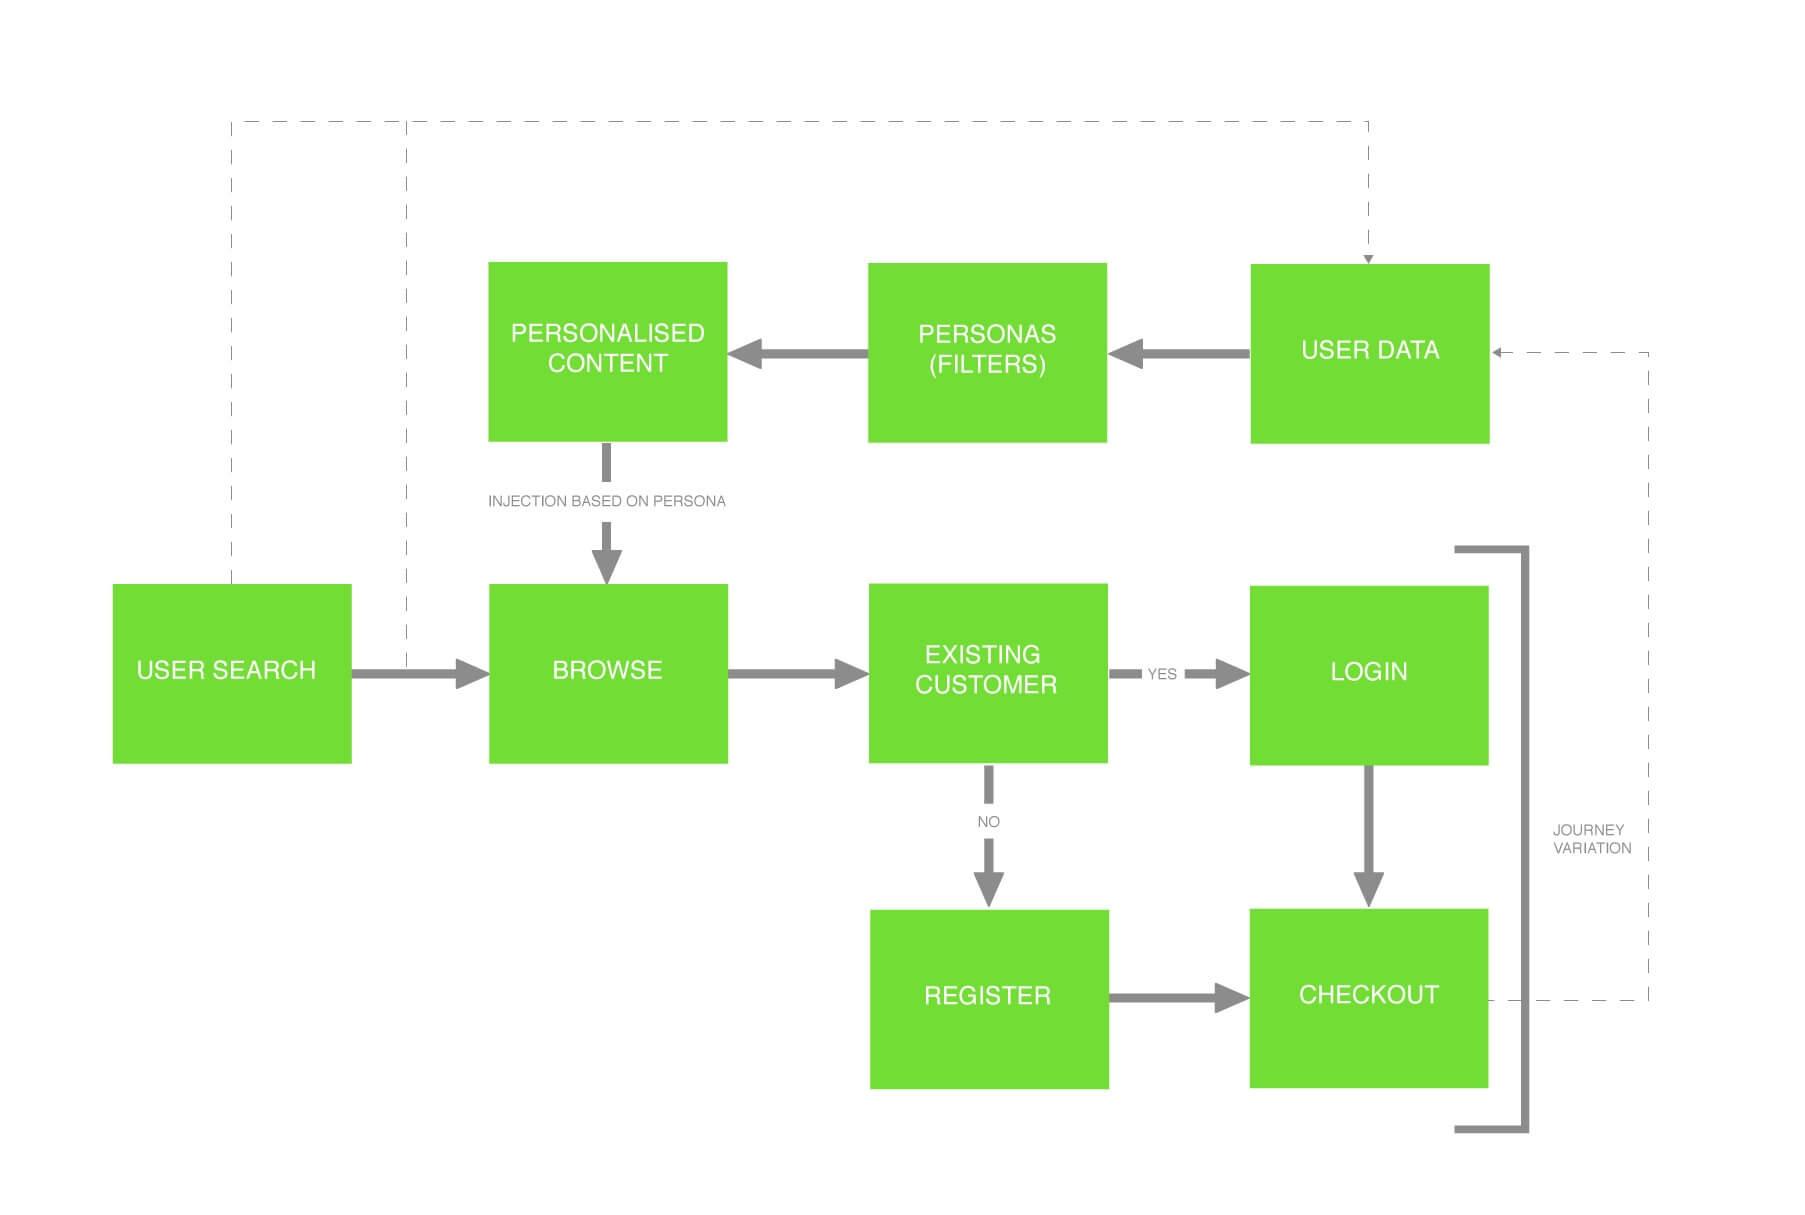 journey performance diagram